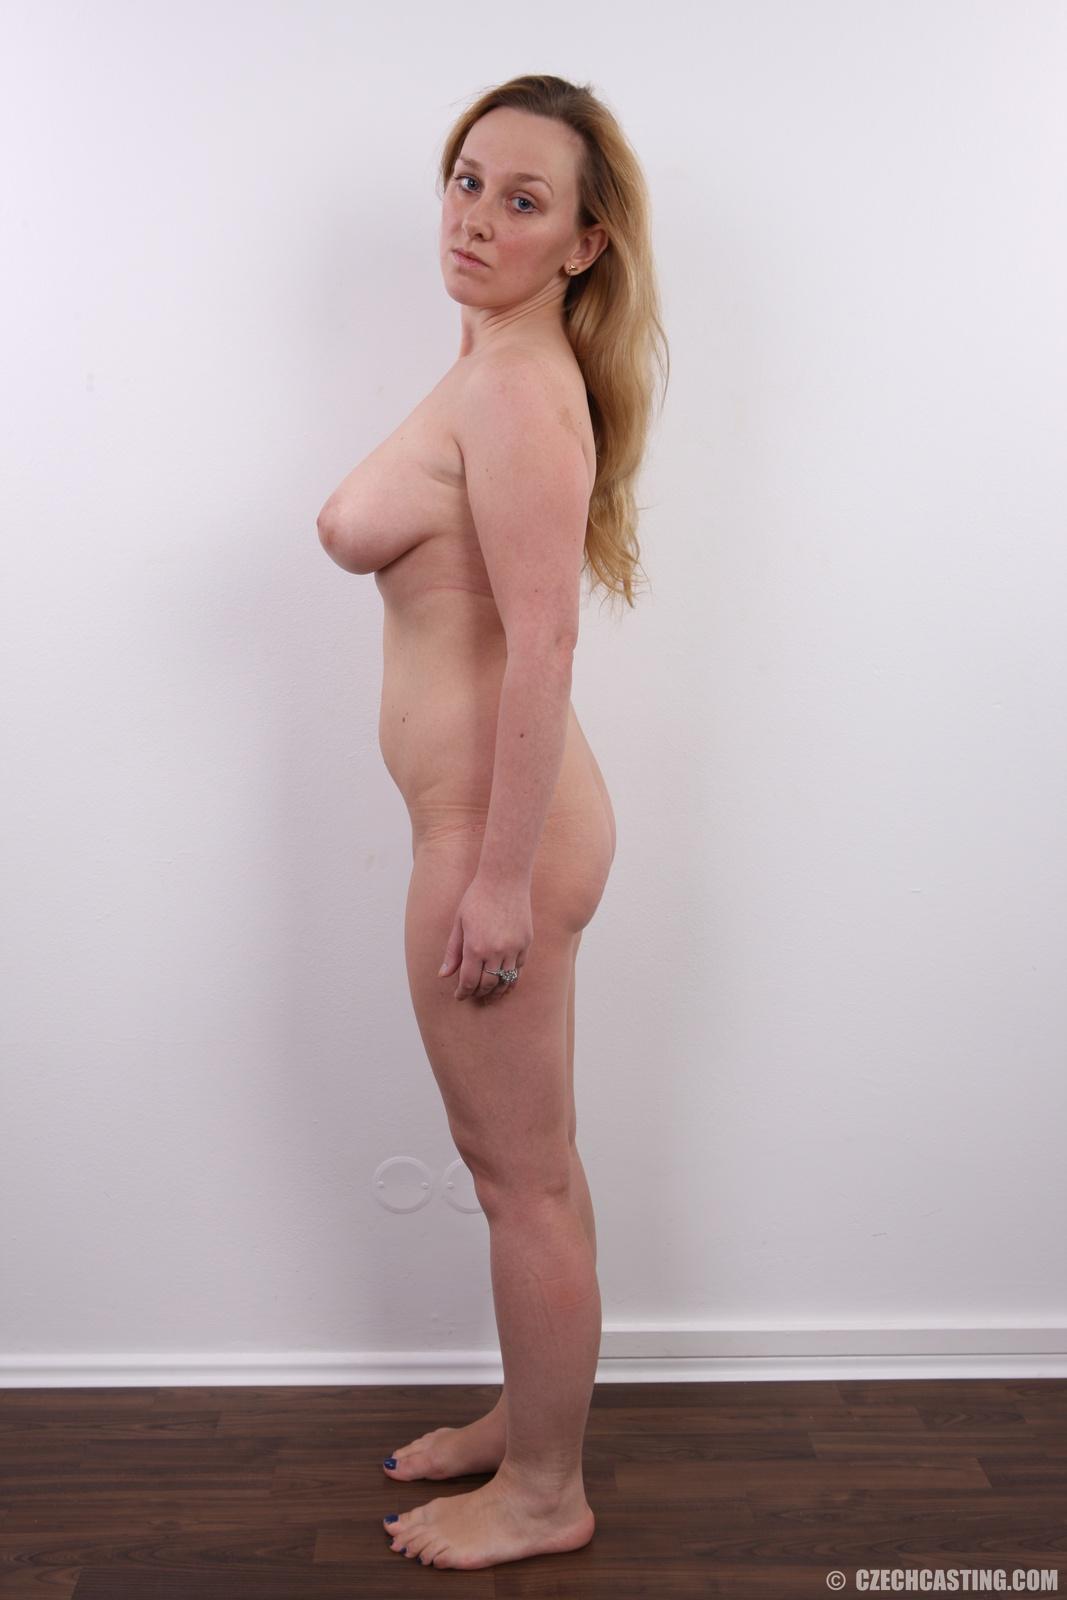 Magdalena Brzeska nackt Oben ohne Bilder Playboy Fotos